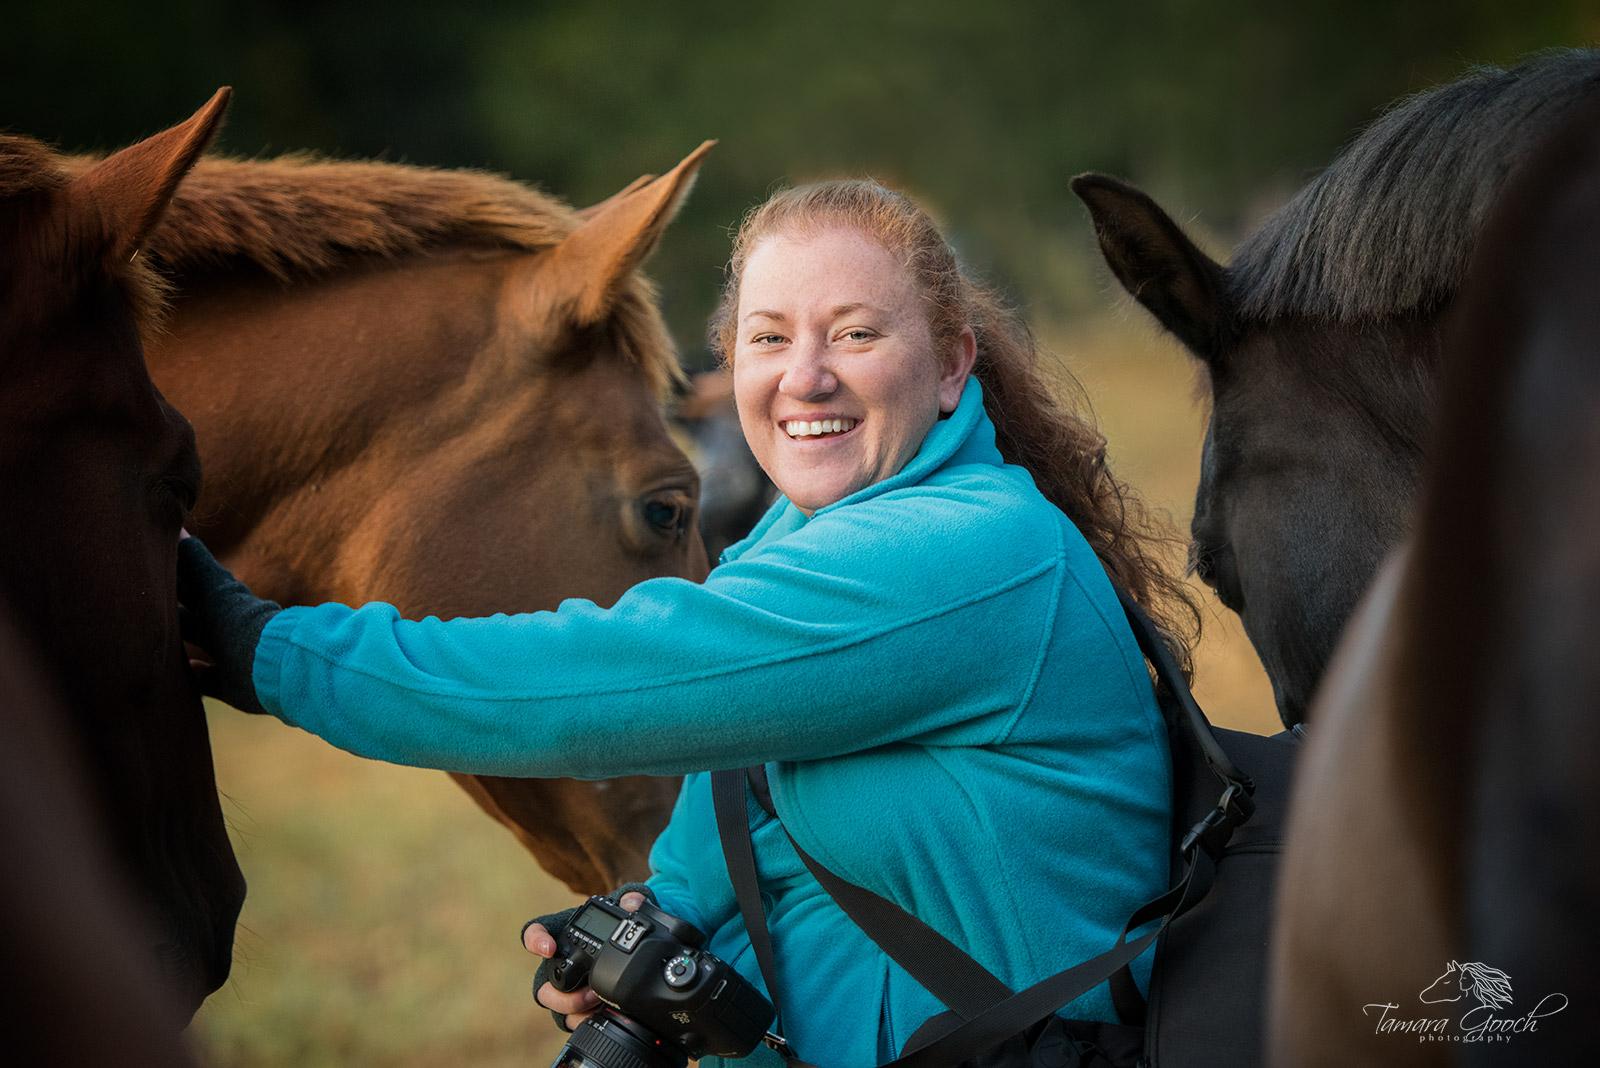 Horse Photography Workshops